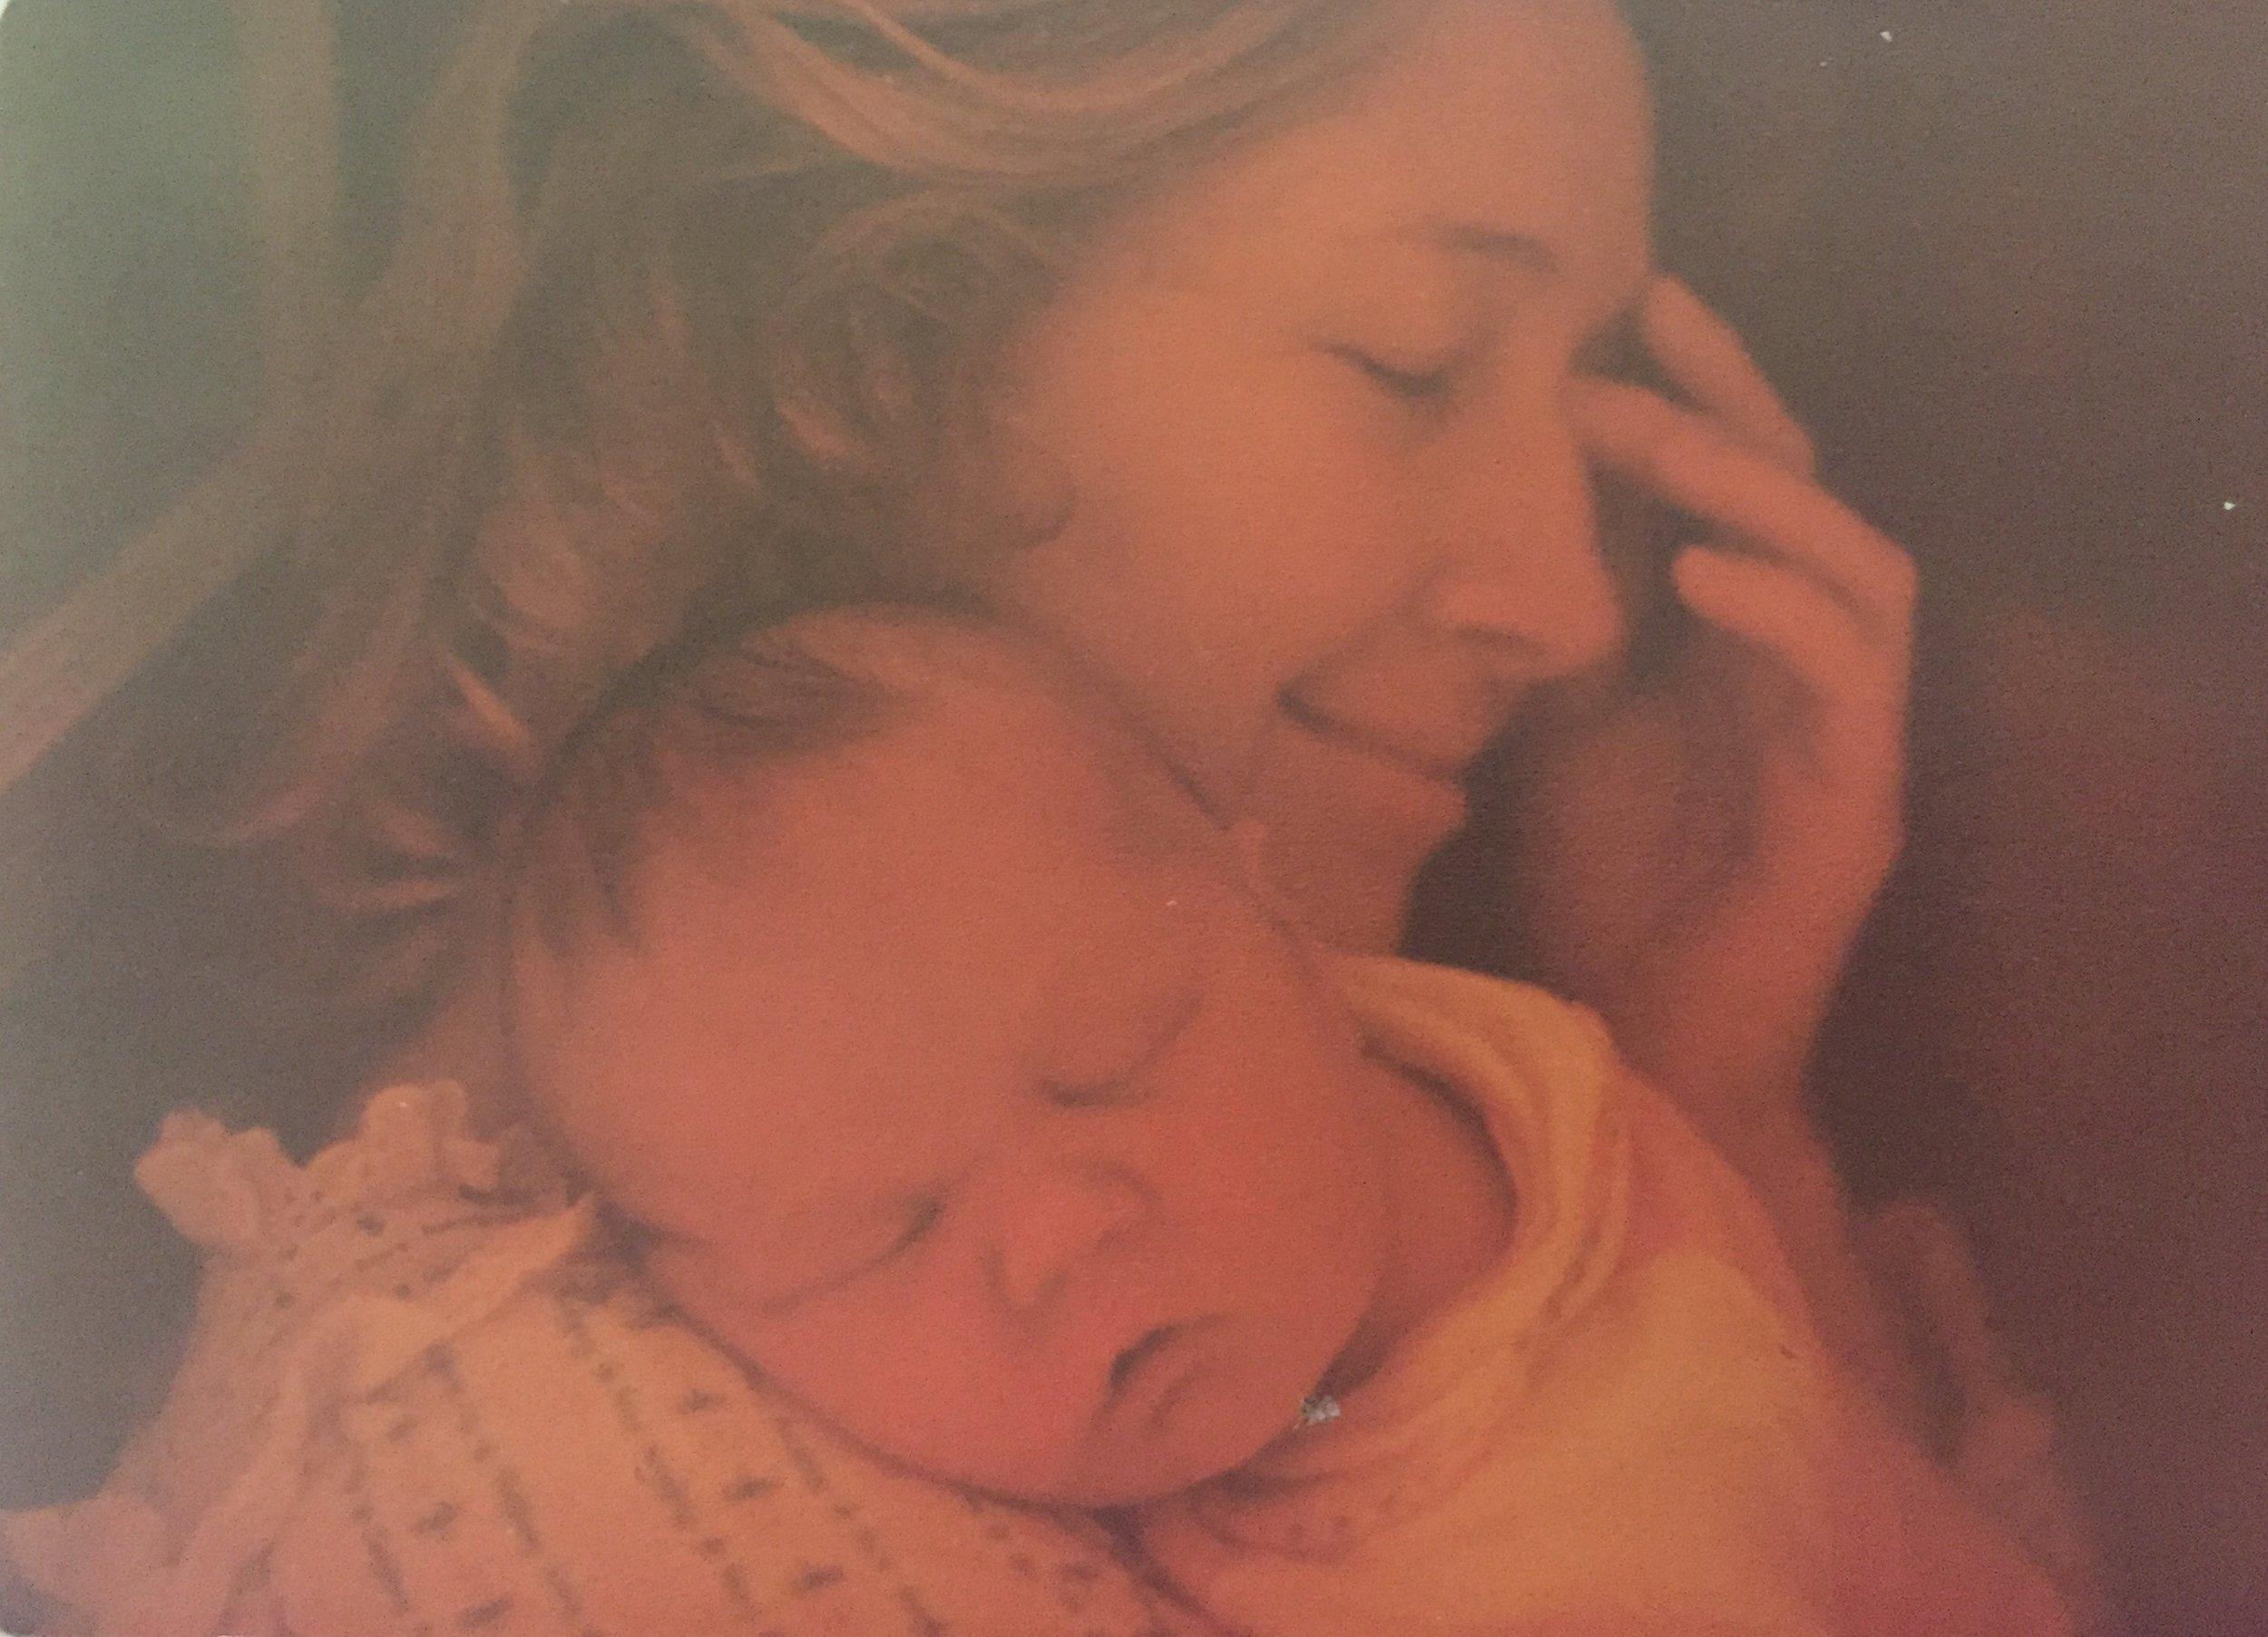 Little Baby SUzie, First Day OF Life. La MEsa, CA 1978